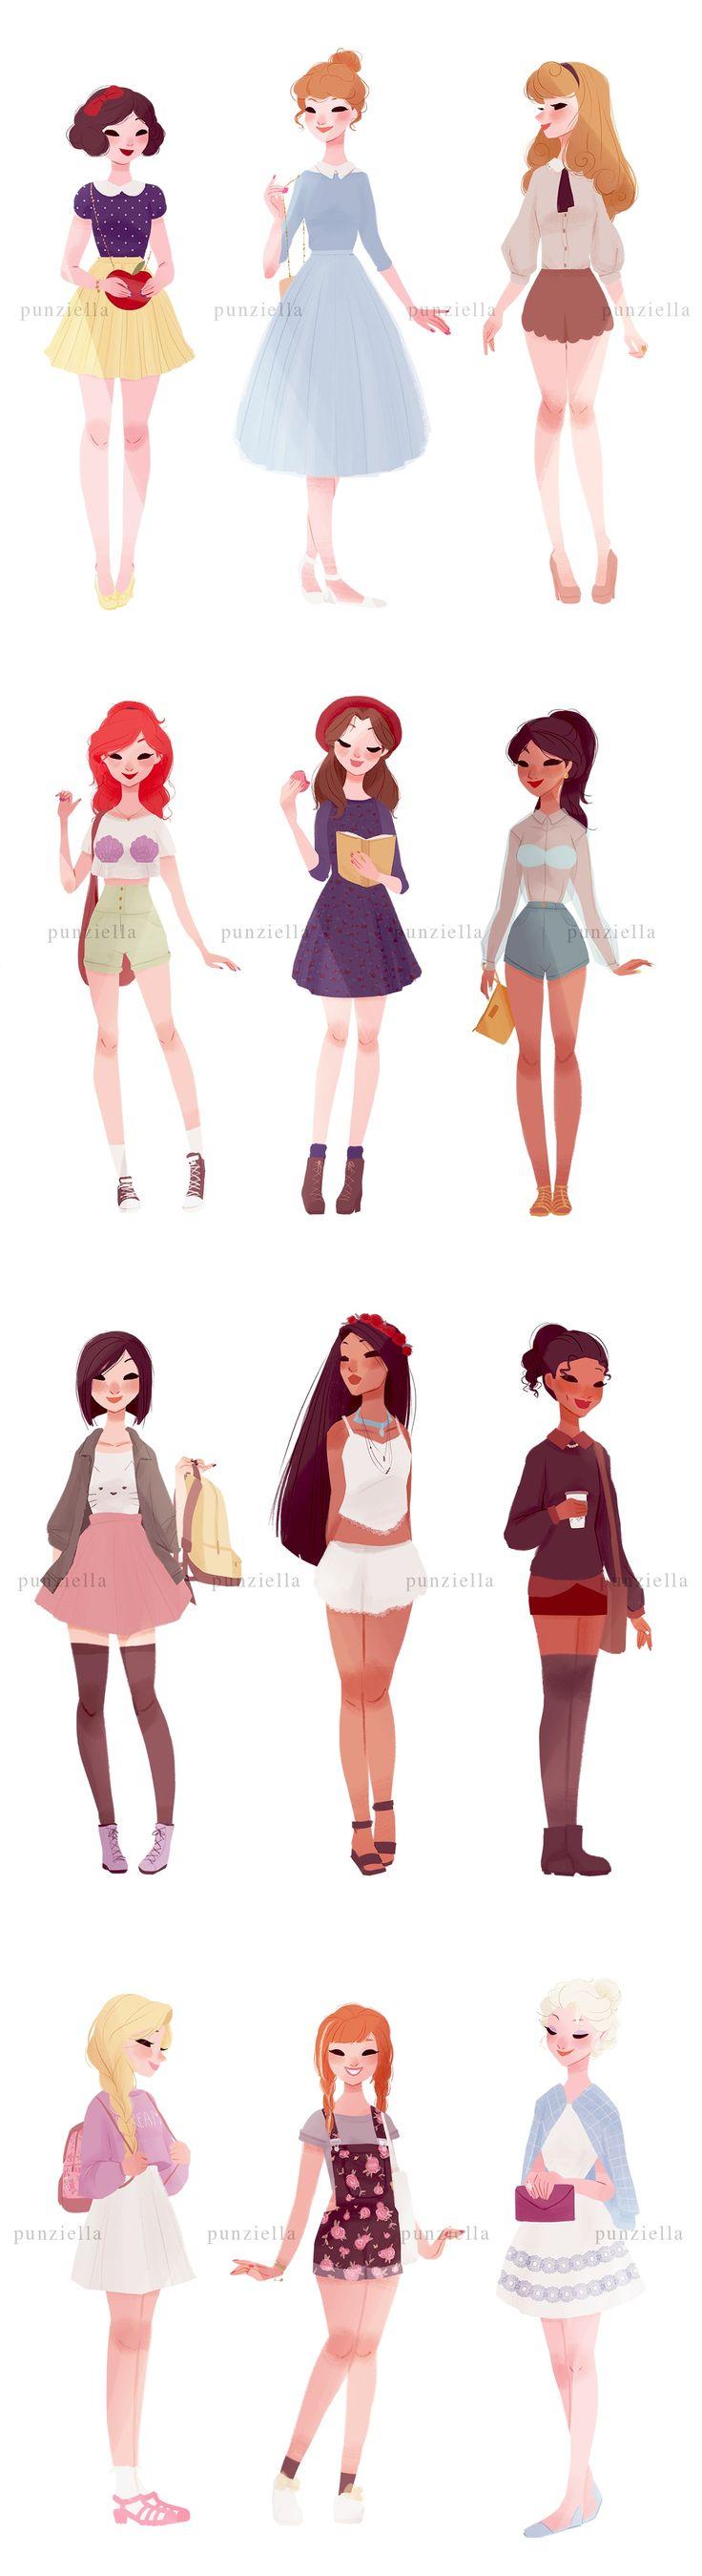 Disney princesses #casual